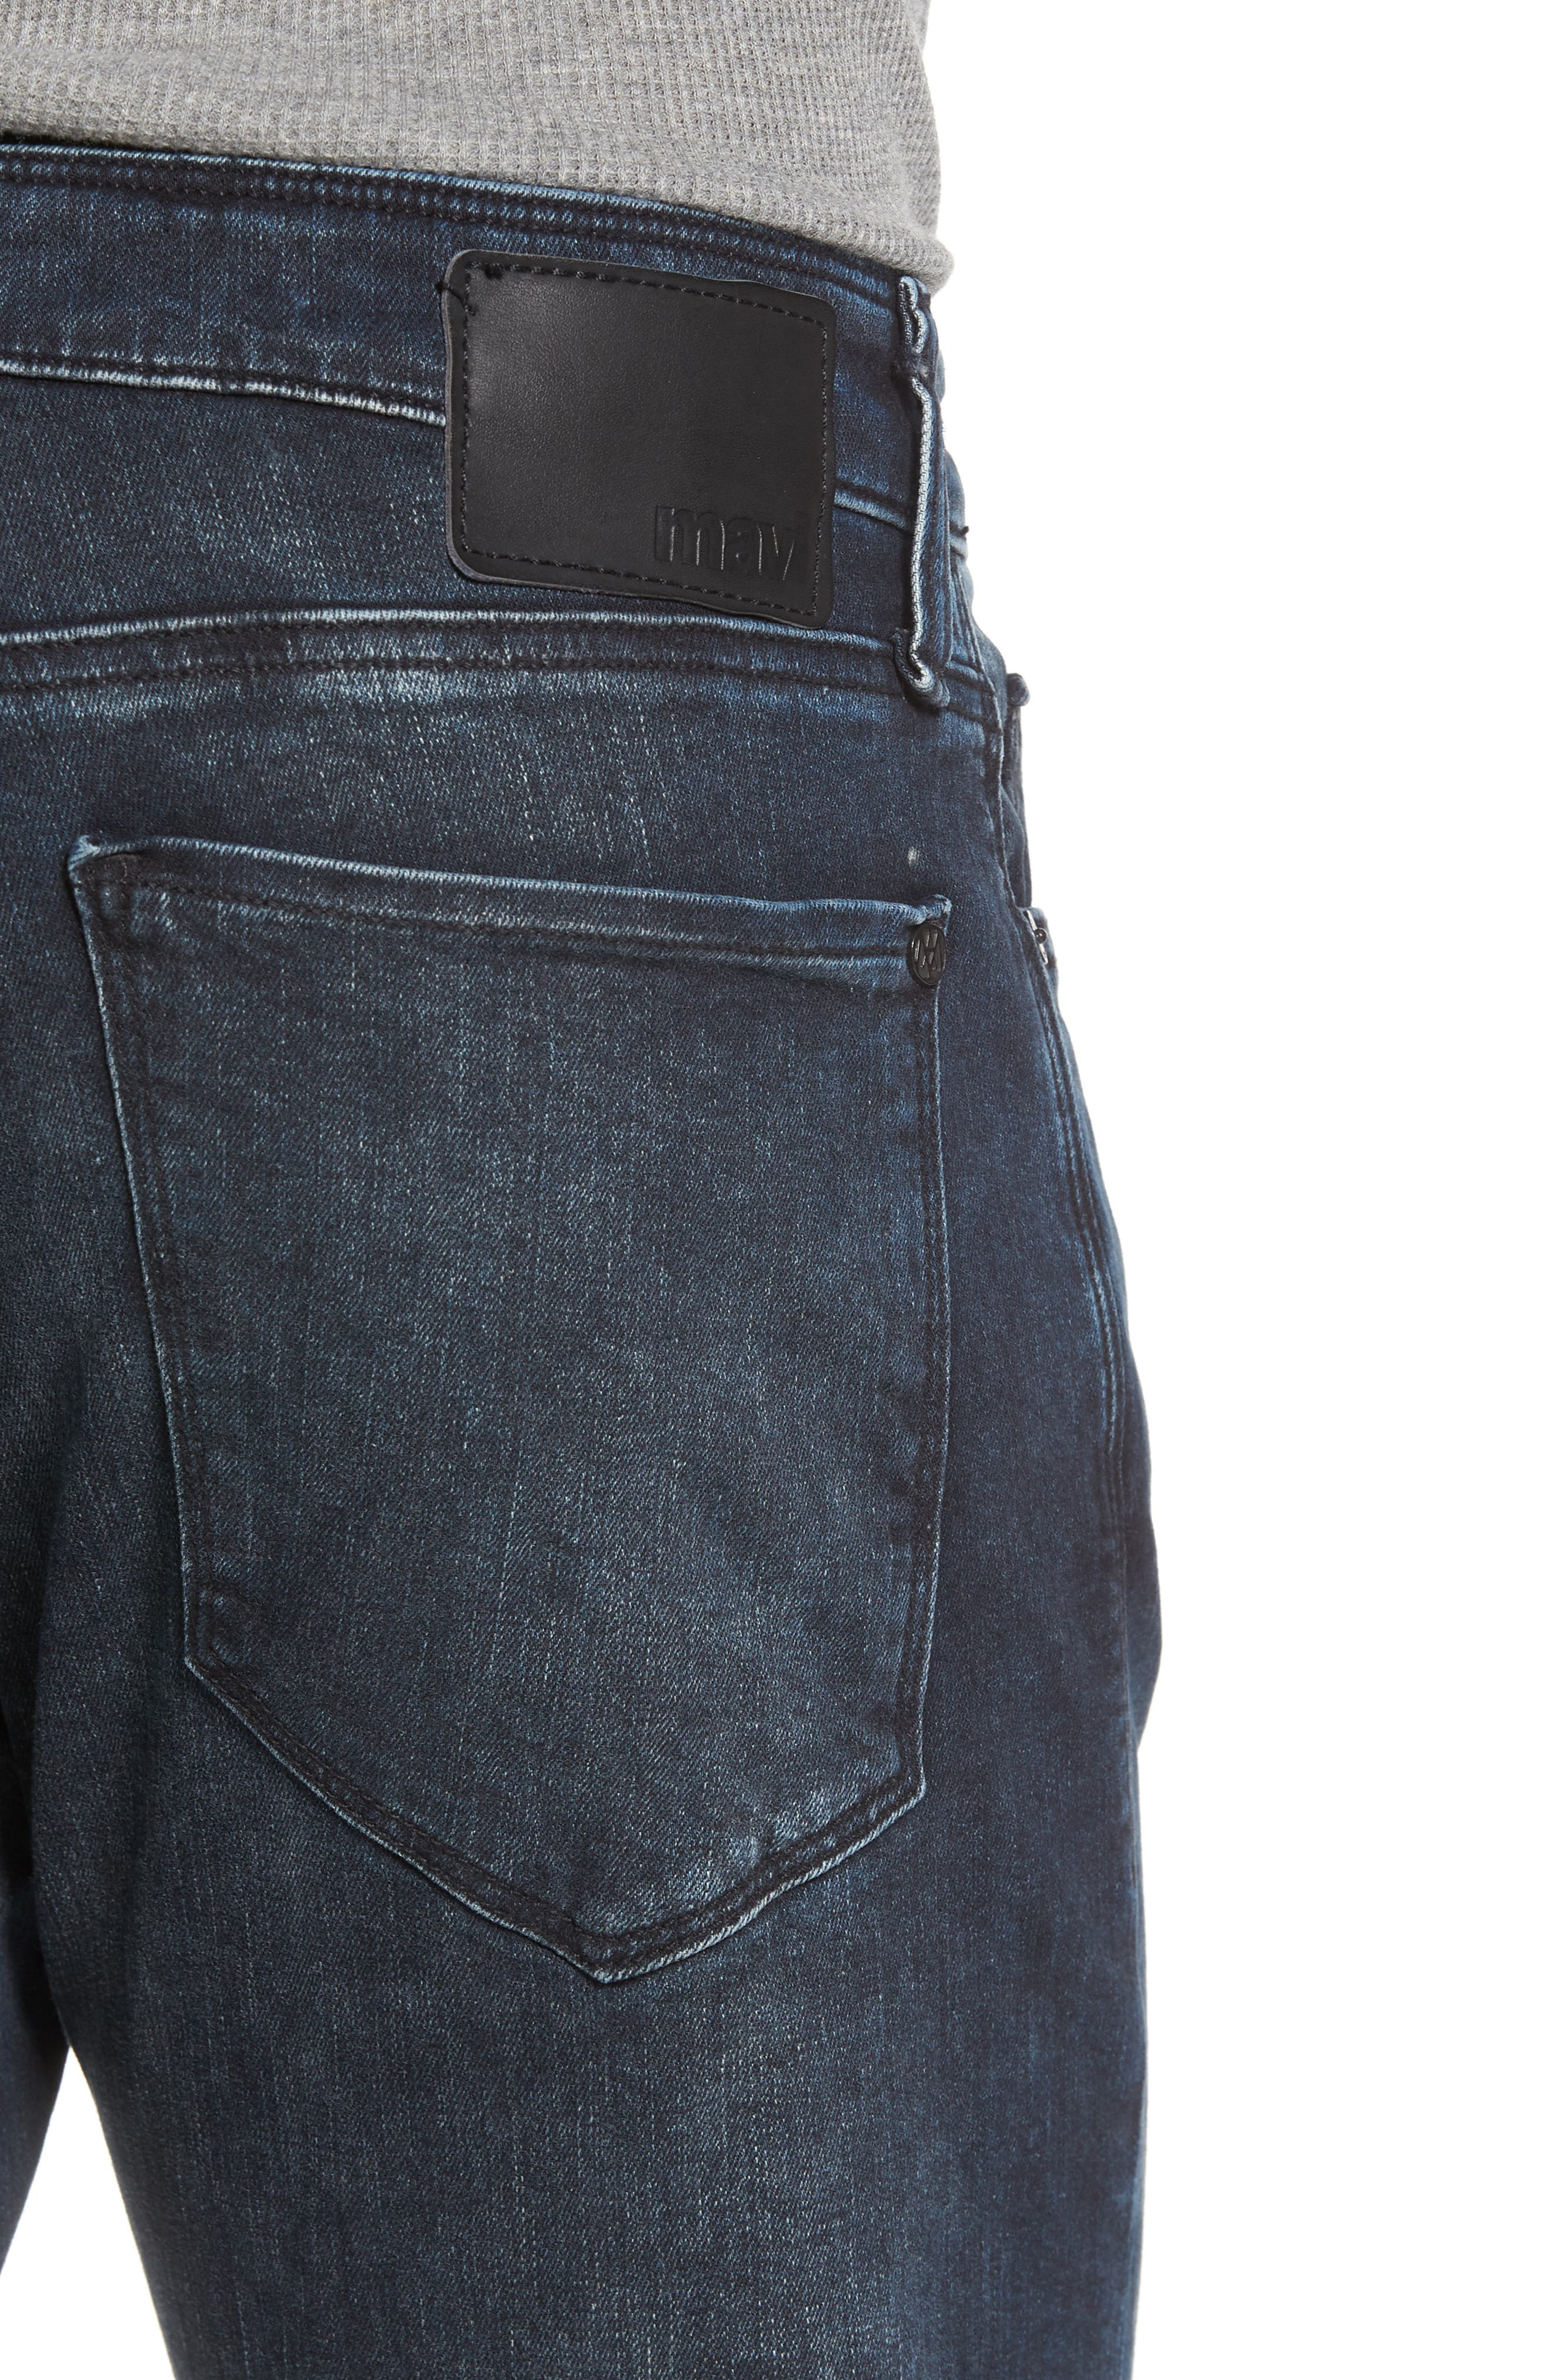 Jake Slim Fit Jeans,                             Alternate thumbnail 4, color,                             Ink Used Authentic Vintage